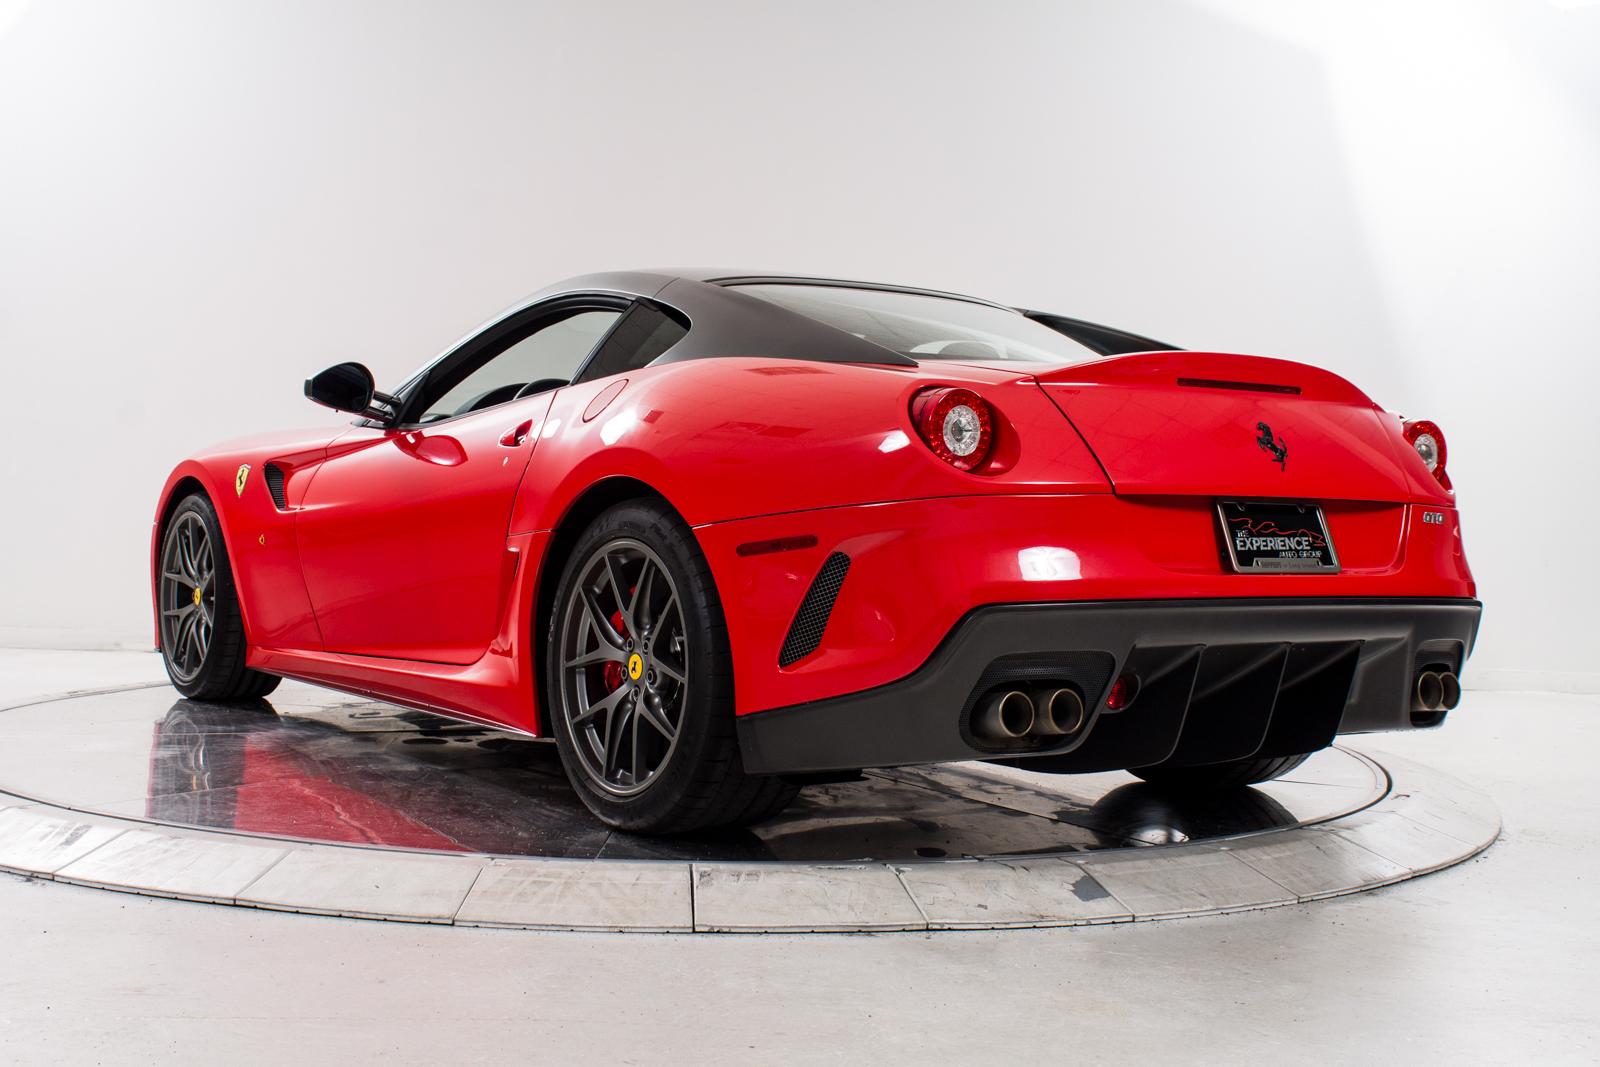 Gallery Ferrari 599 GTO For Sale  13 photos  GTspirit